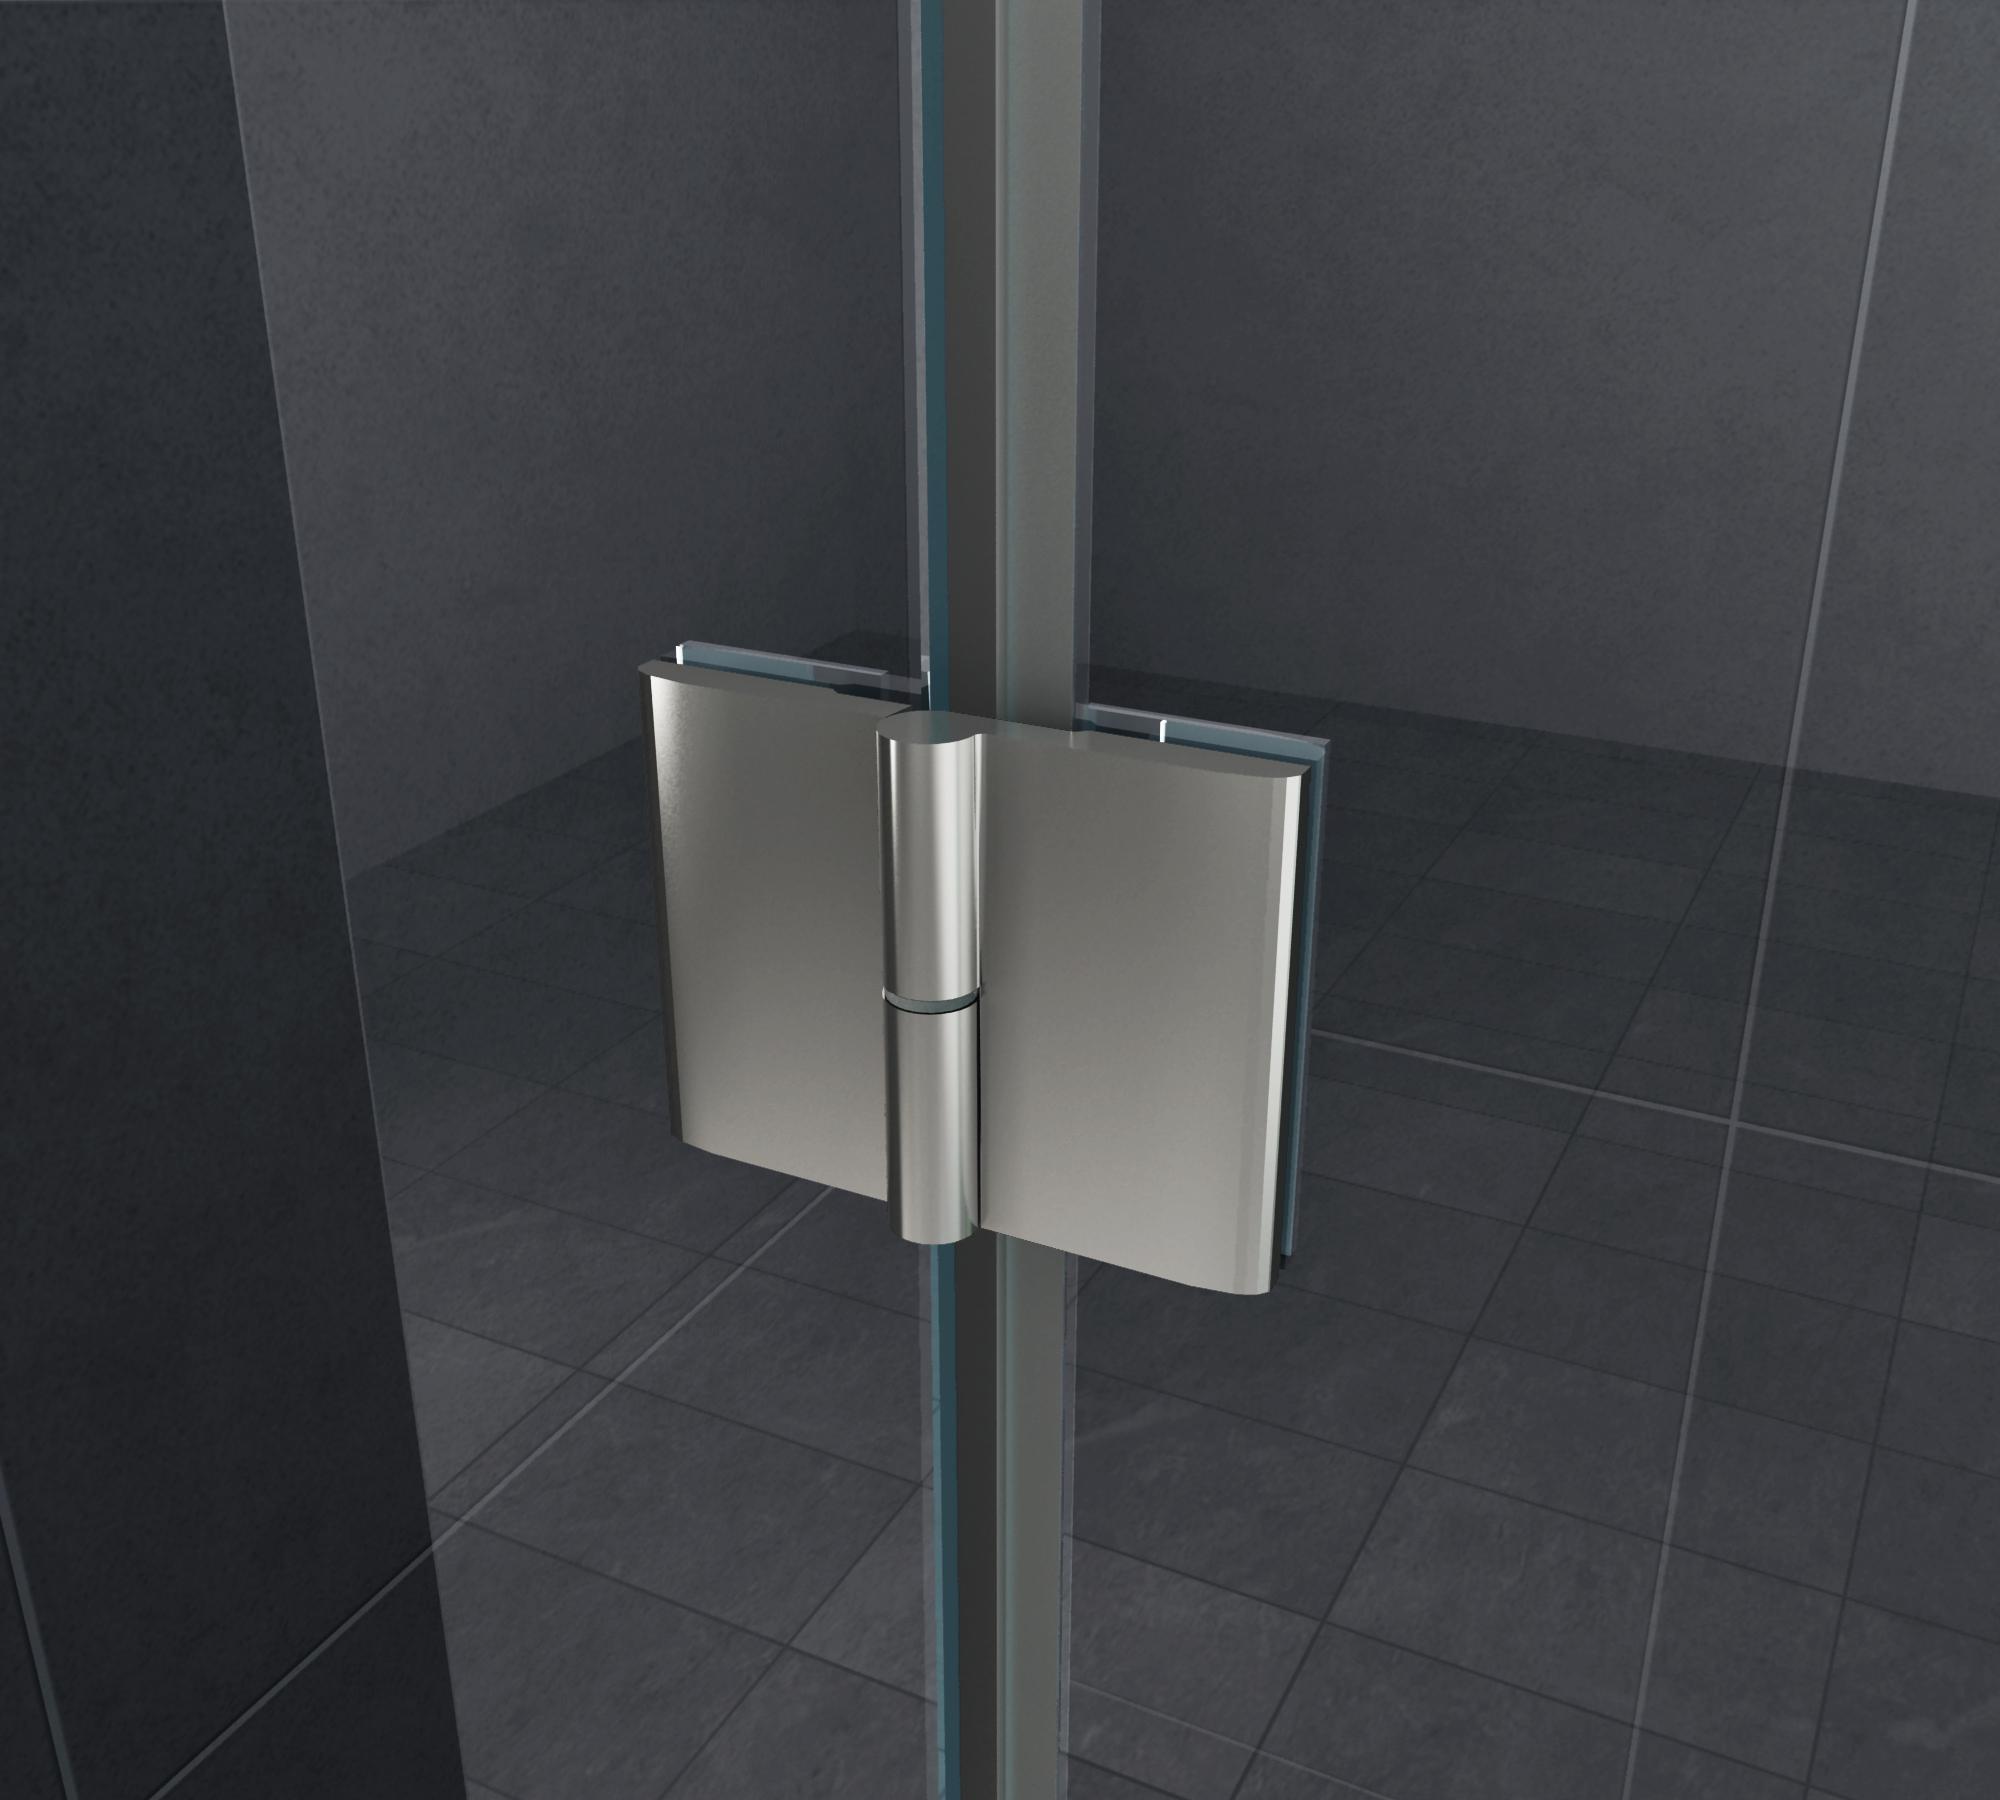 rahmenlose duschkabine luxorline 90 x 90 x 195 cm ohne duschtasse glasdeals. Black Bedroom Furniture Sets. Home Design Ideas